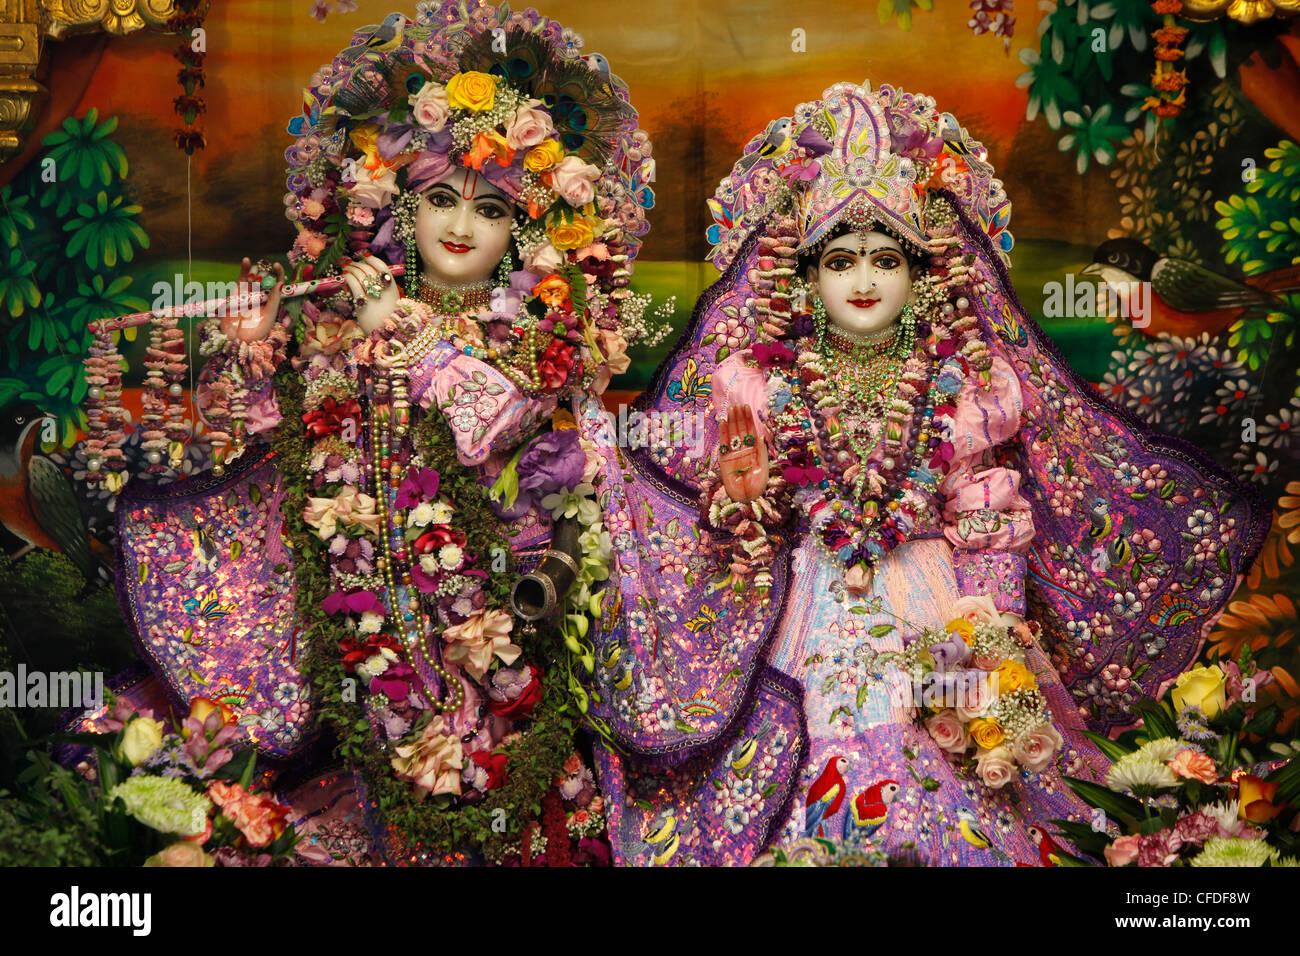 Krishna et Rada statues au Bhaktivedanta Manor (ISKCON temple Hare Krishna), Watford, Hertfordshire, Angleterre, Royaume-Uni Banque D'Images